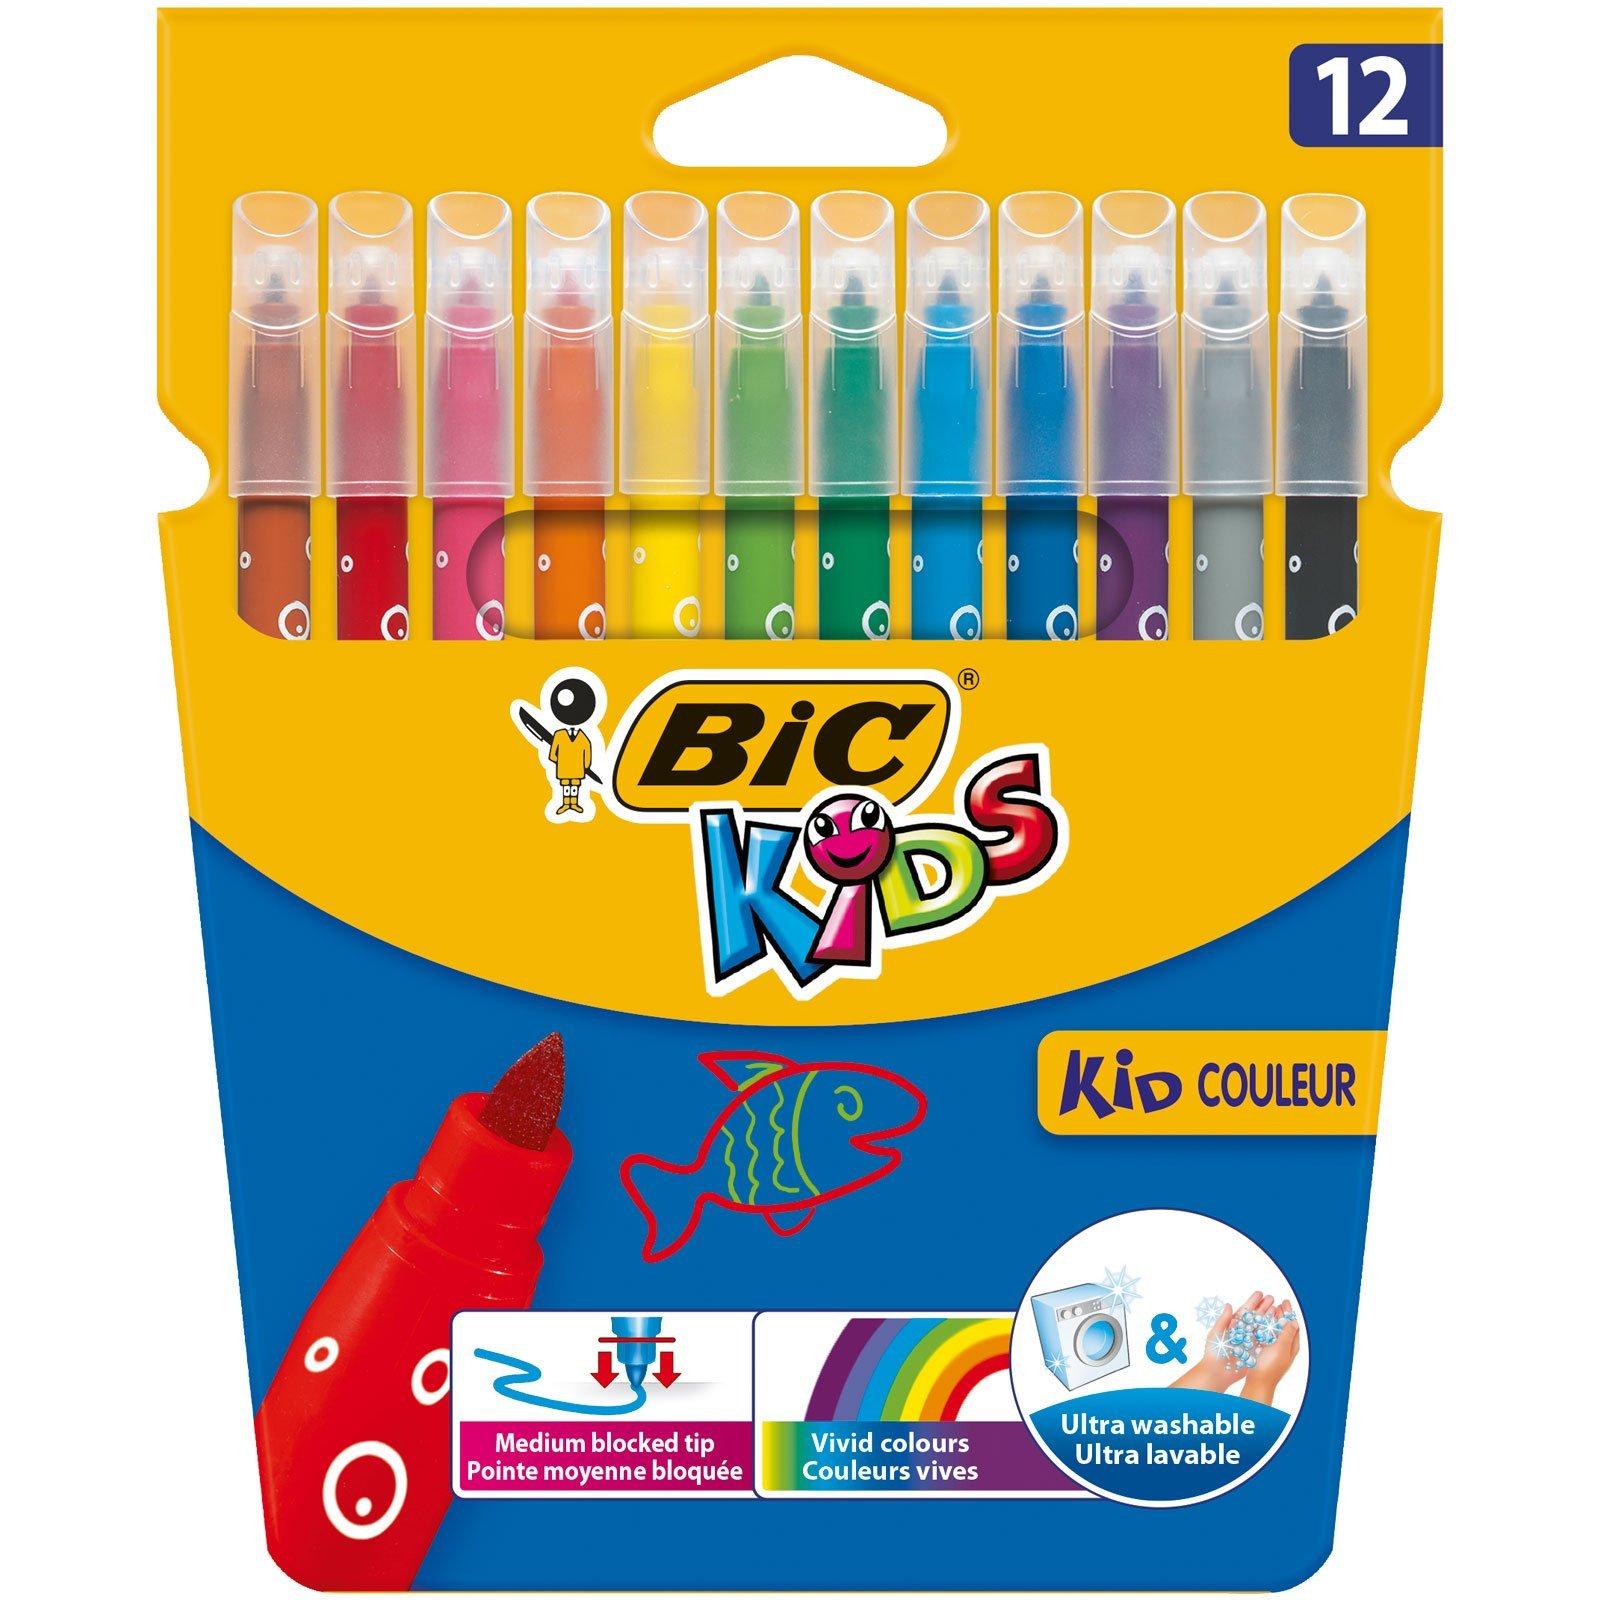 BIC Kids Kid Couleur rotuladores punta media – colores Surtidos, Blíster de 12 unidades